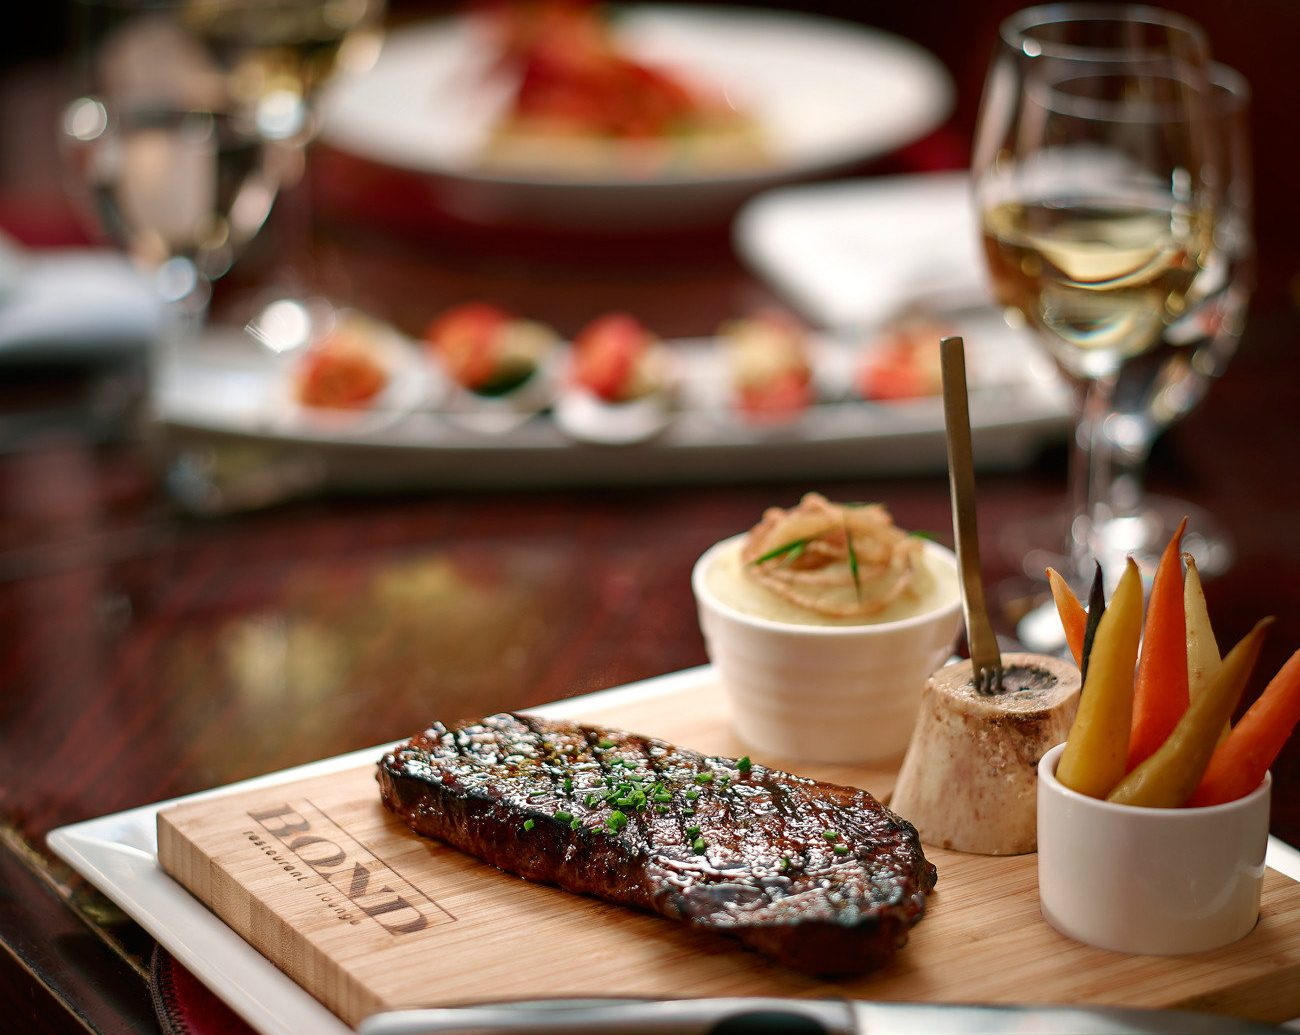 Hotels table indoor meal plate restaurant food dinner brunch dish breakfast lunch sense cuisine supper